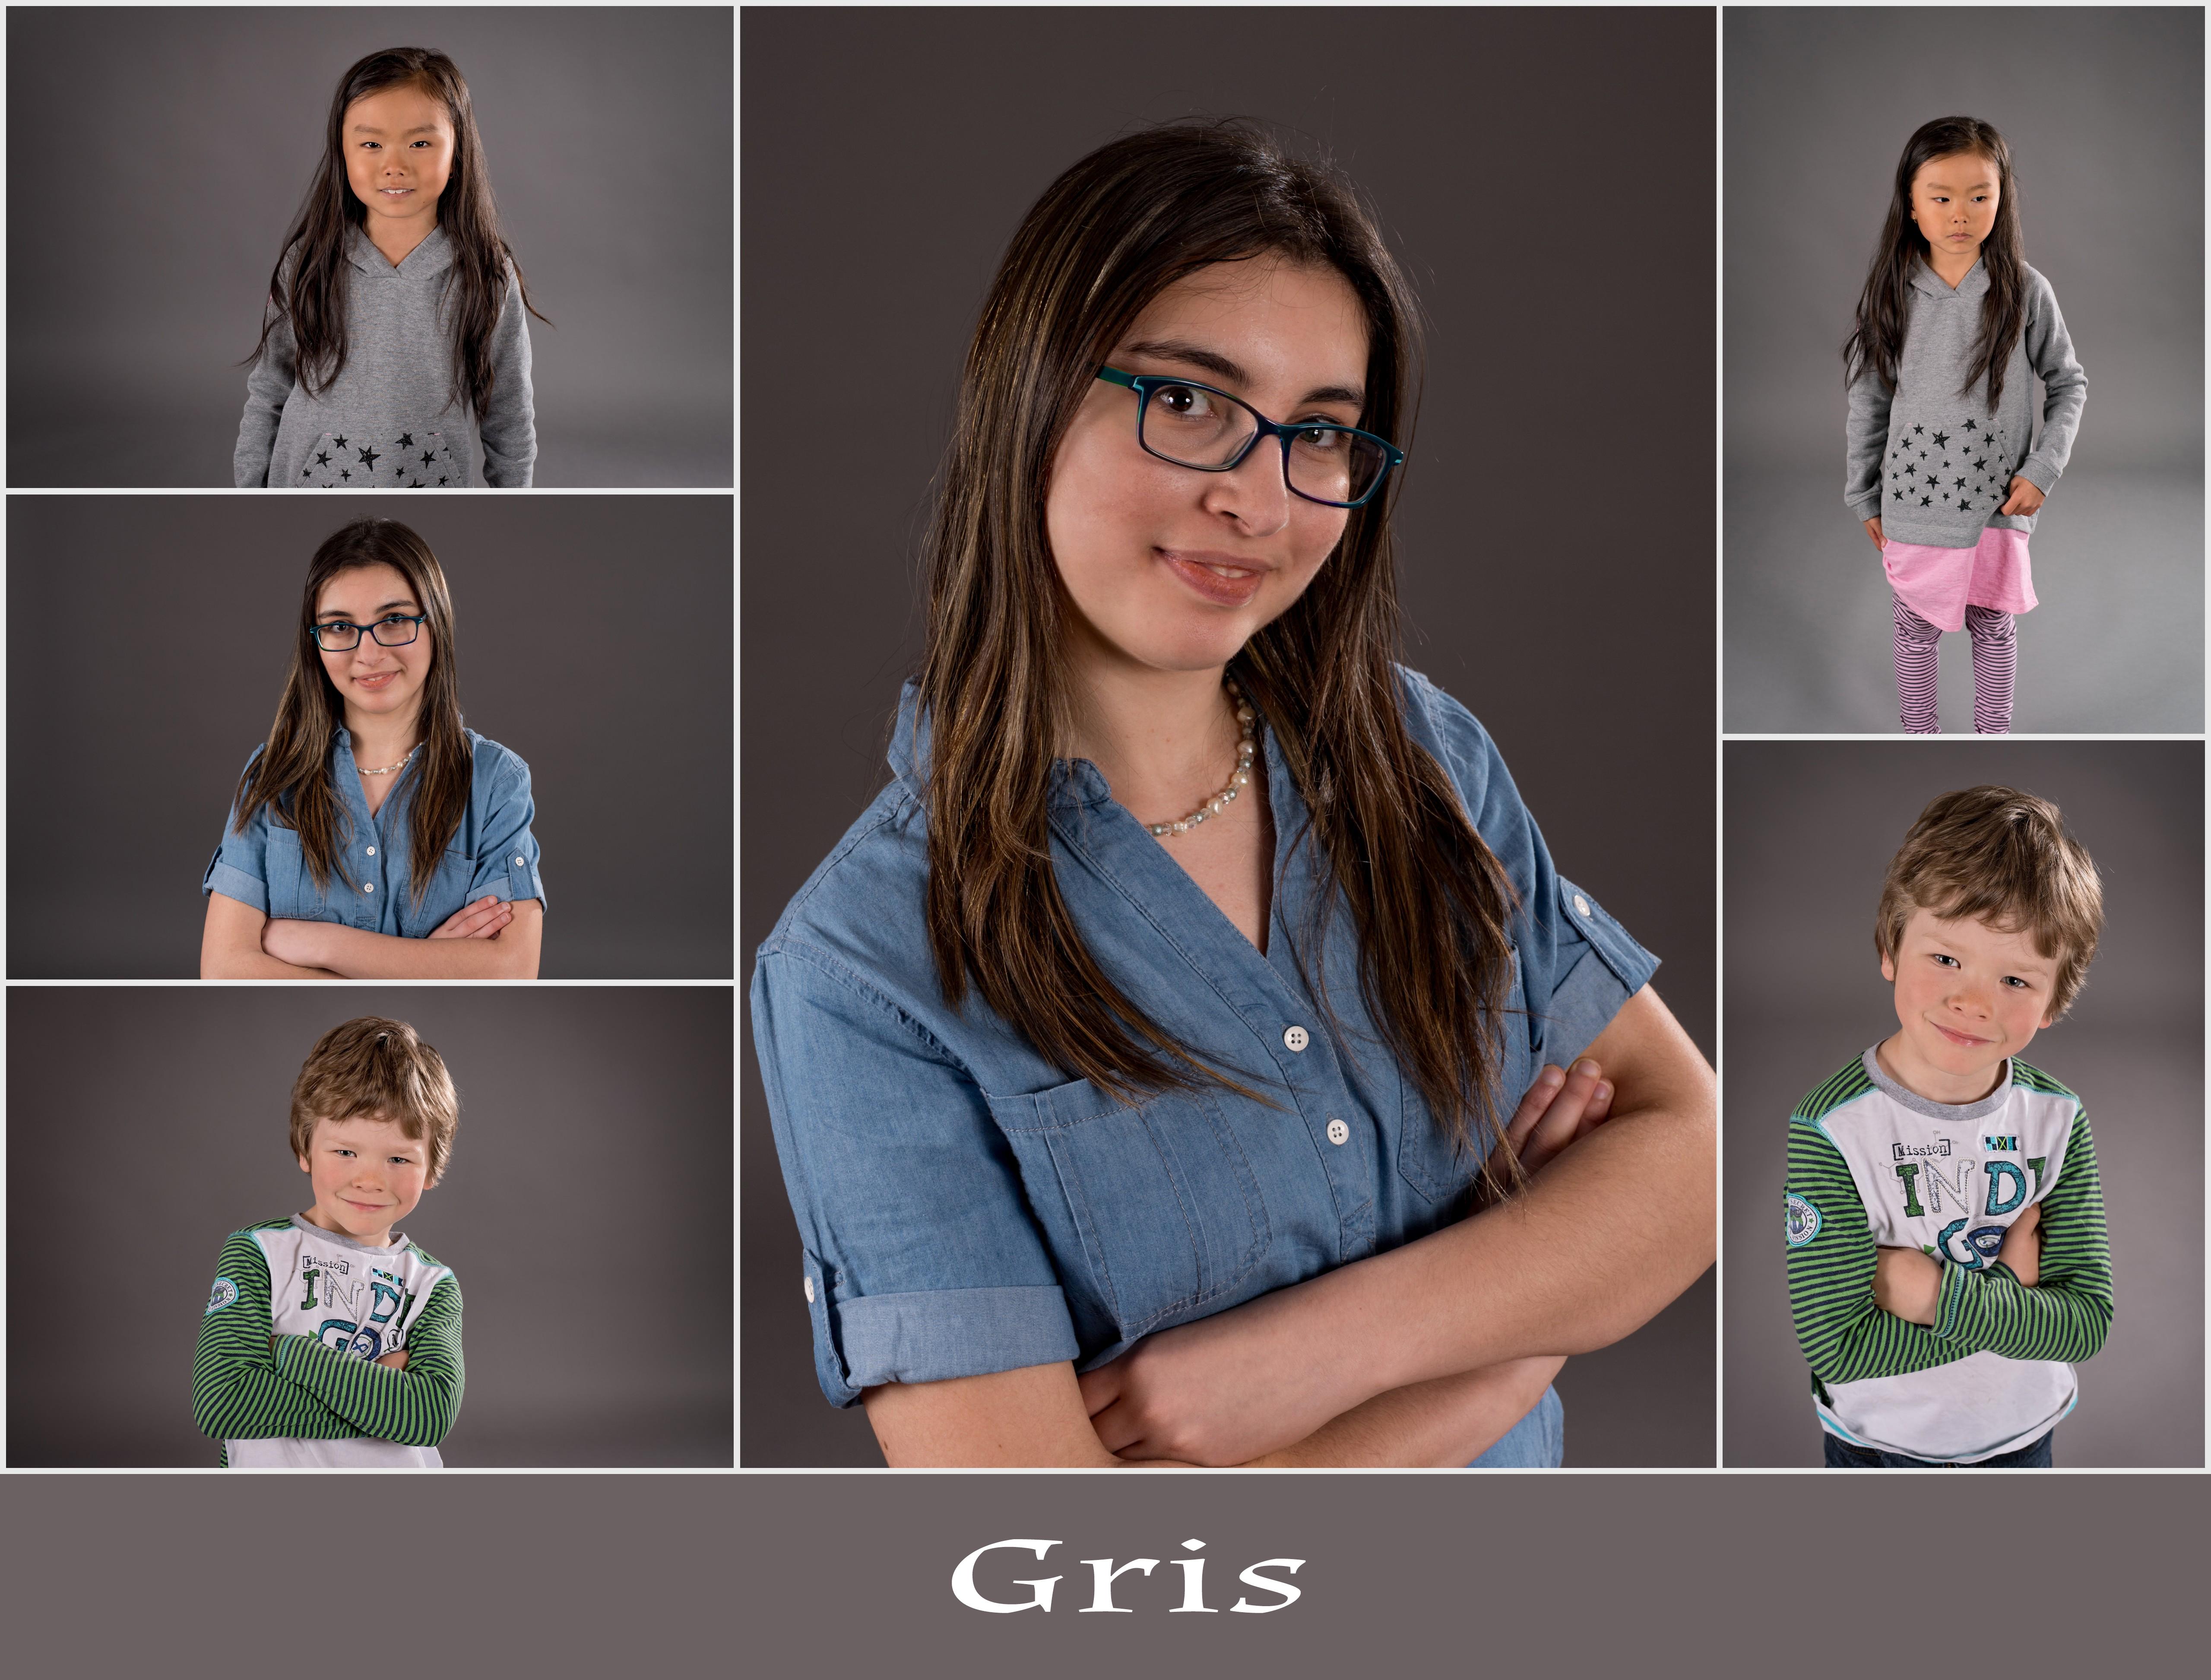 Fond gris studio photo